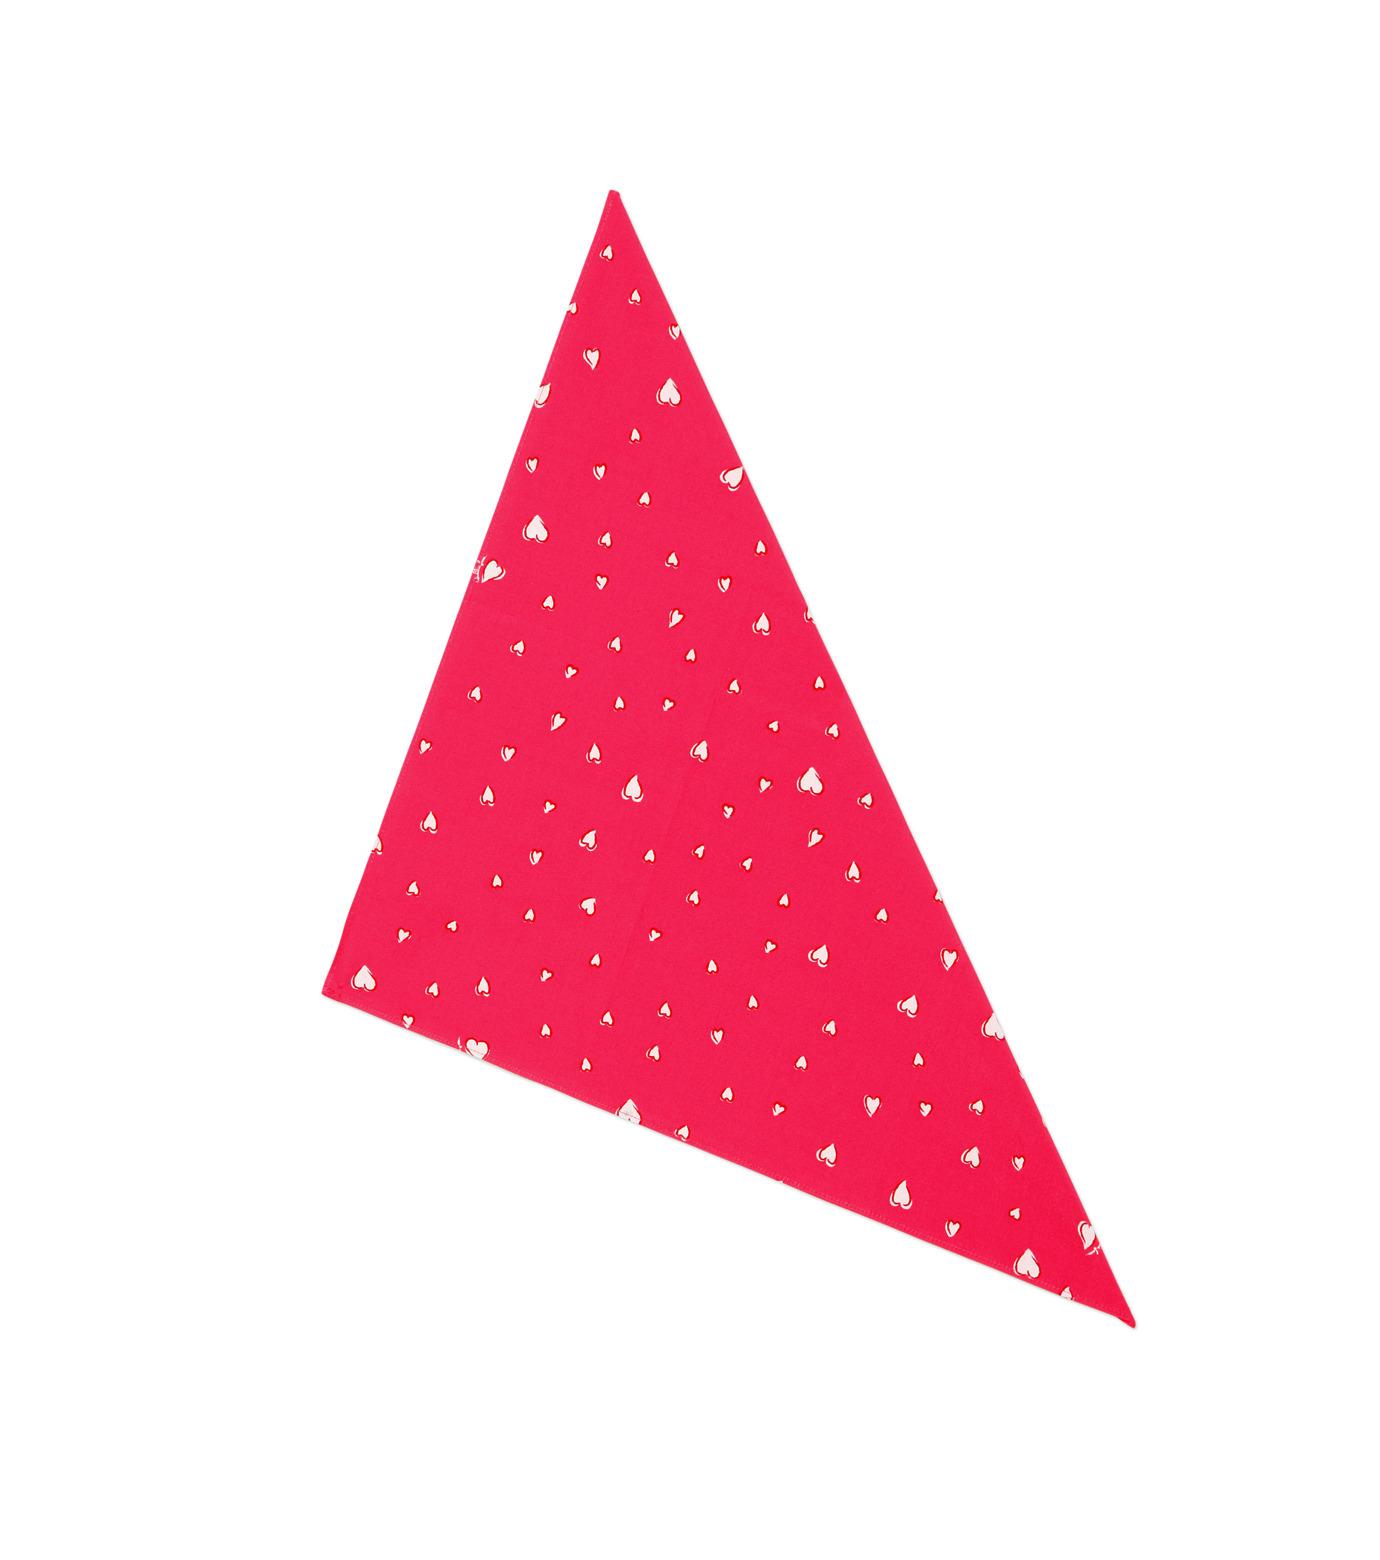 HL HEDDIE LOVU(エイチエル・エディールーヴ)のHEART PATTERN SHIRT-PINK(シャツ/shirt)-18S93001-72 拡大詳細画像6